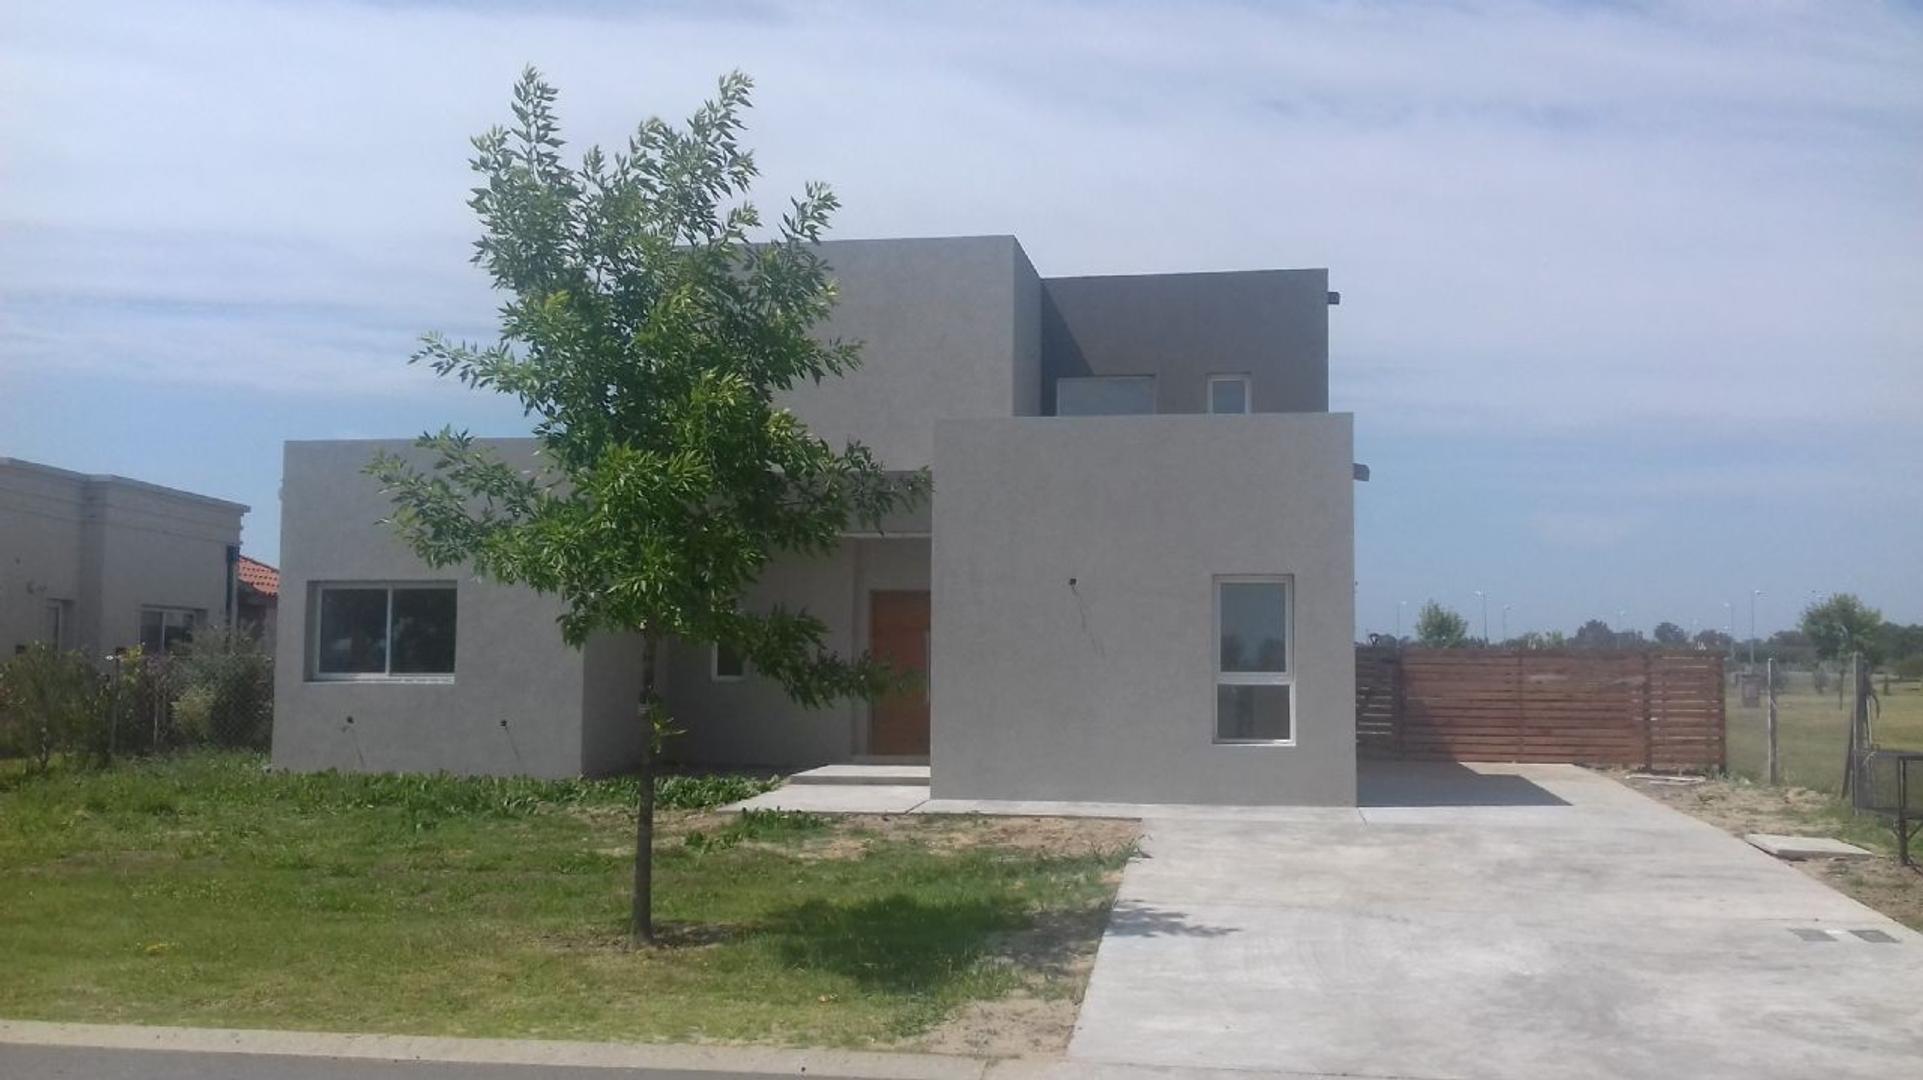 Tizado Pilar - Casa en venta en El Cantón, Escobar - PIL3671_LP123781_1